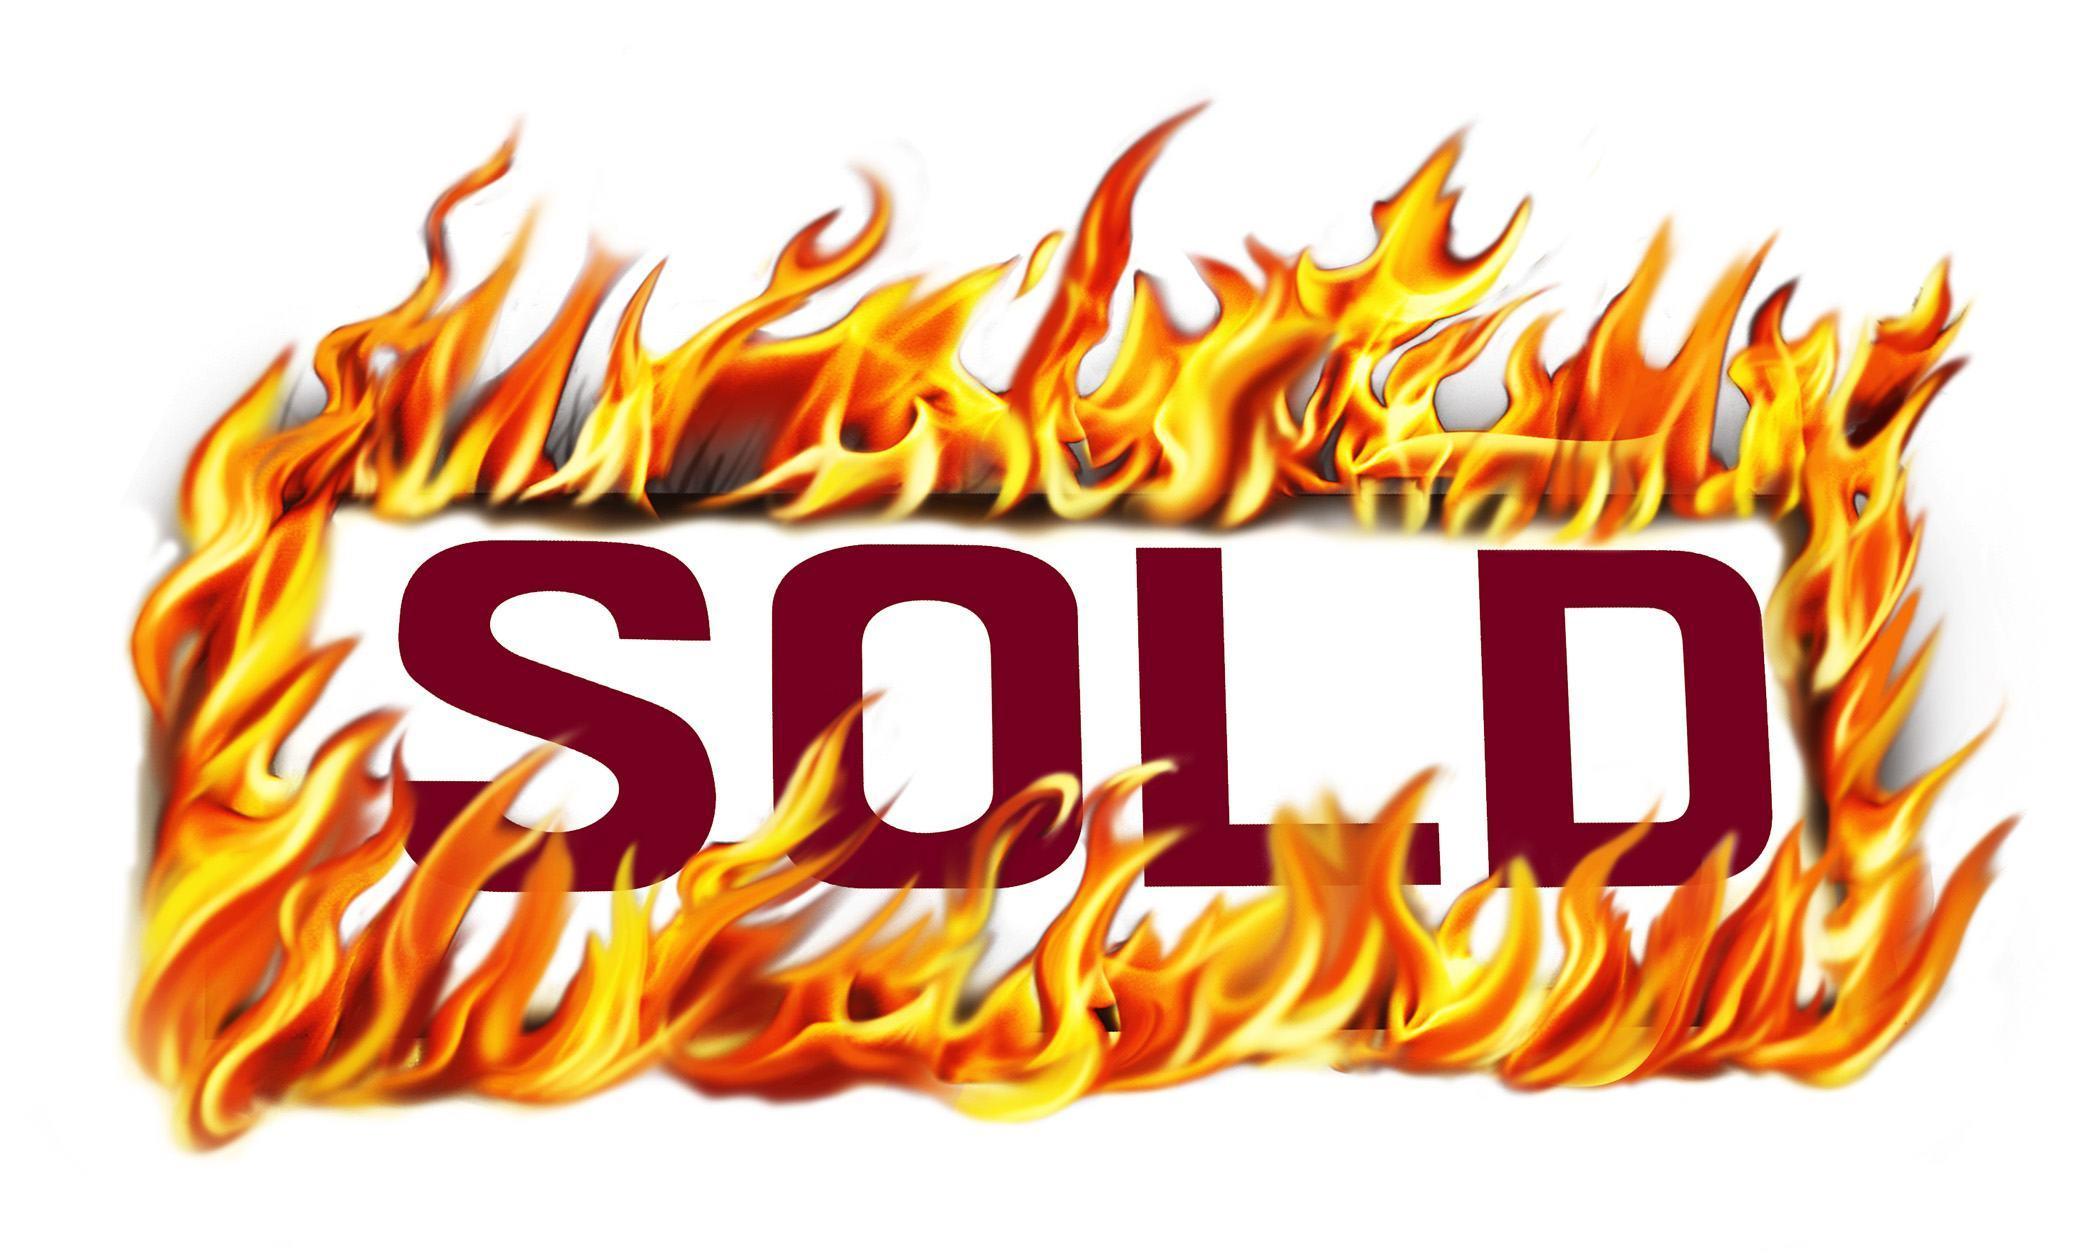 Austin Real estate market on fire